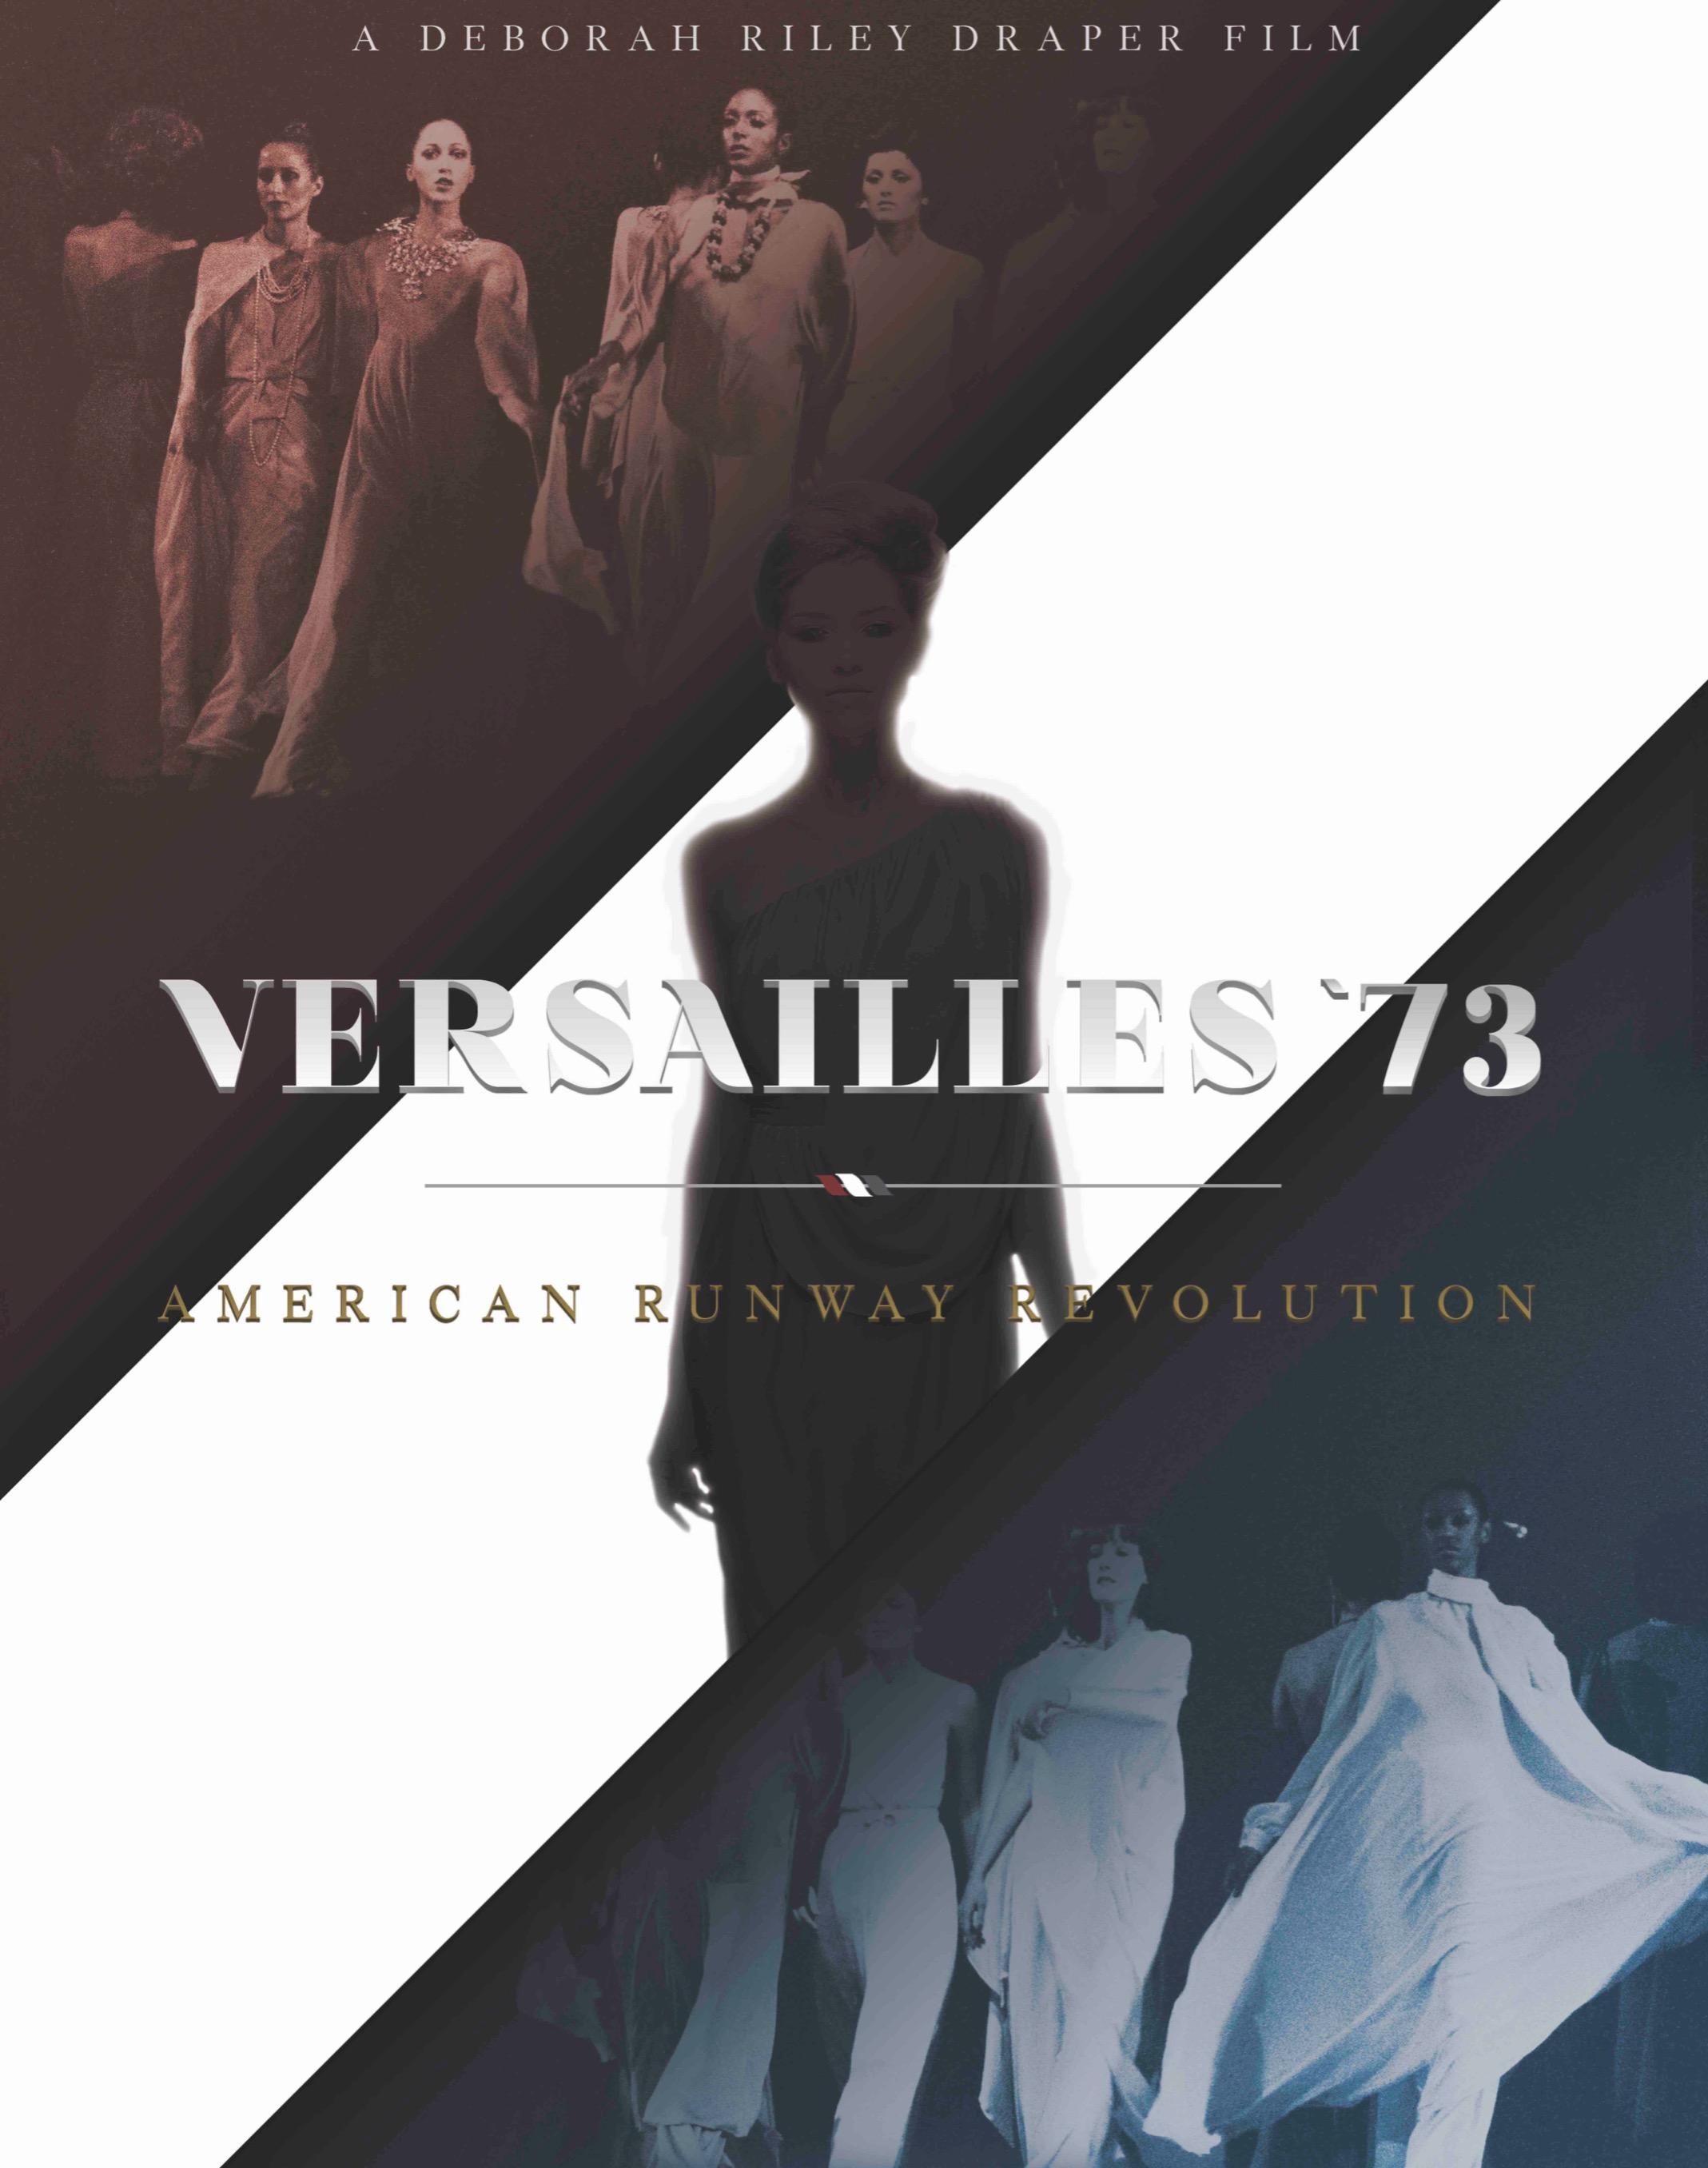 Versailles '73 documentary